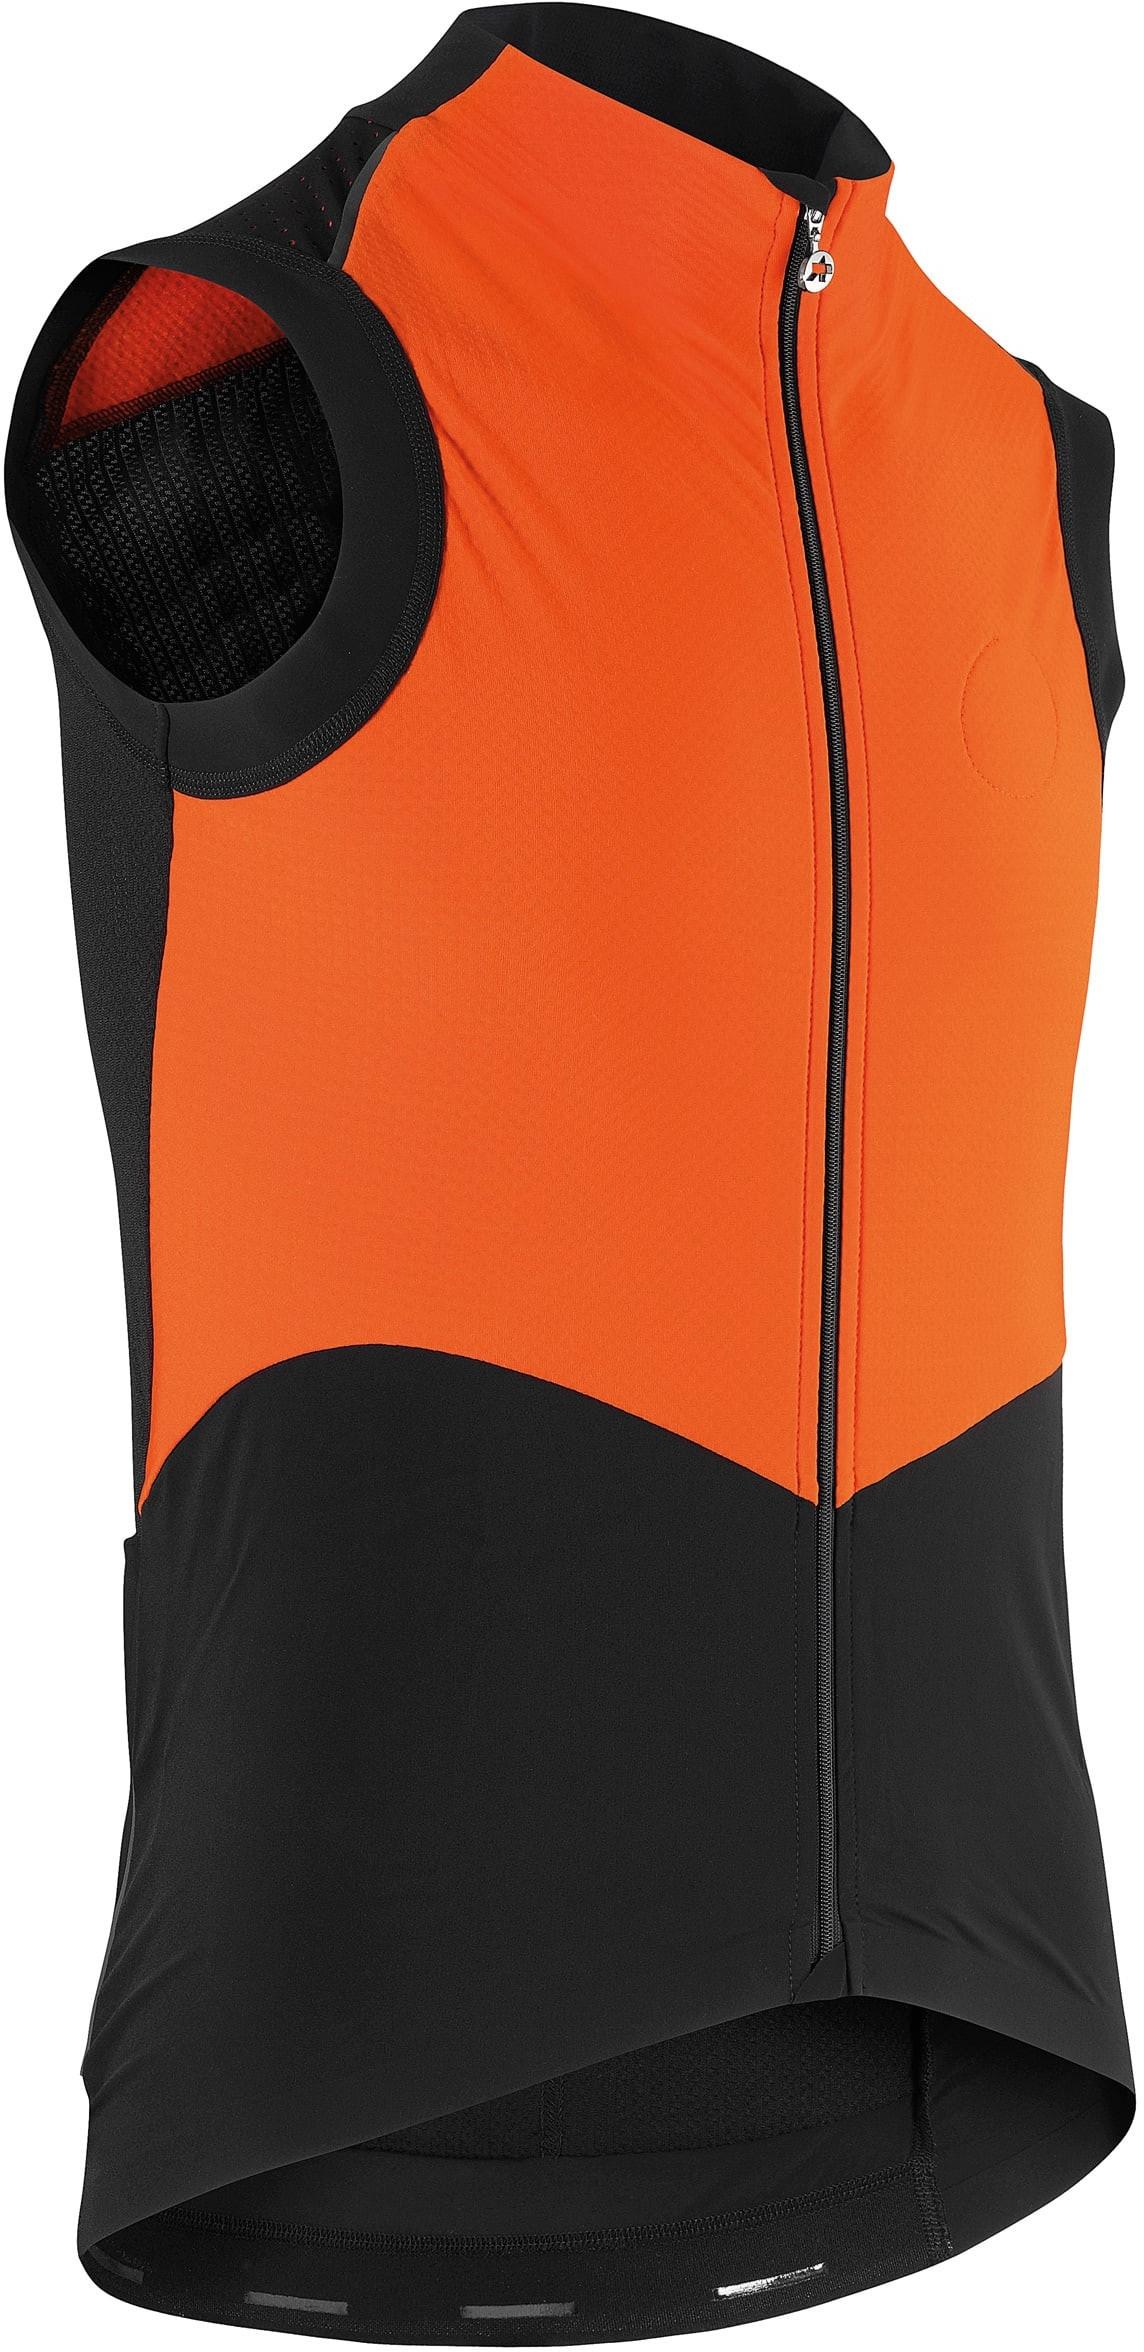 Assos Cykelvest tiburuGiletEquipe Spring/Fall Vest, Sort/Orange